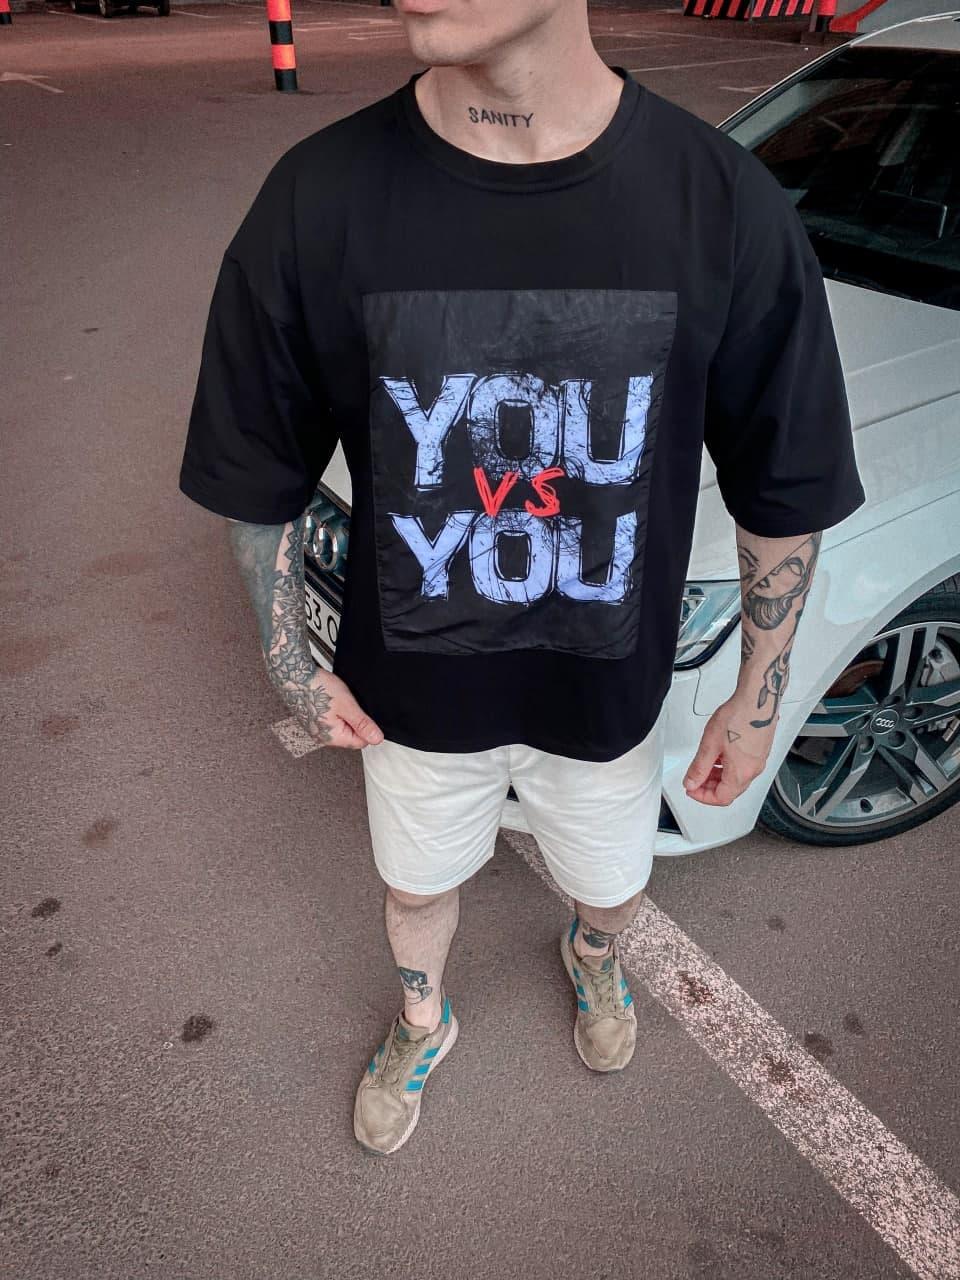 Чоловіча футболка You VS You (чорна) з написом стильний одяг sF233